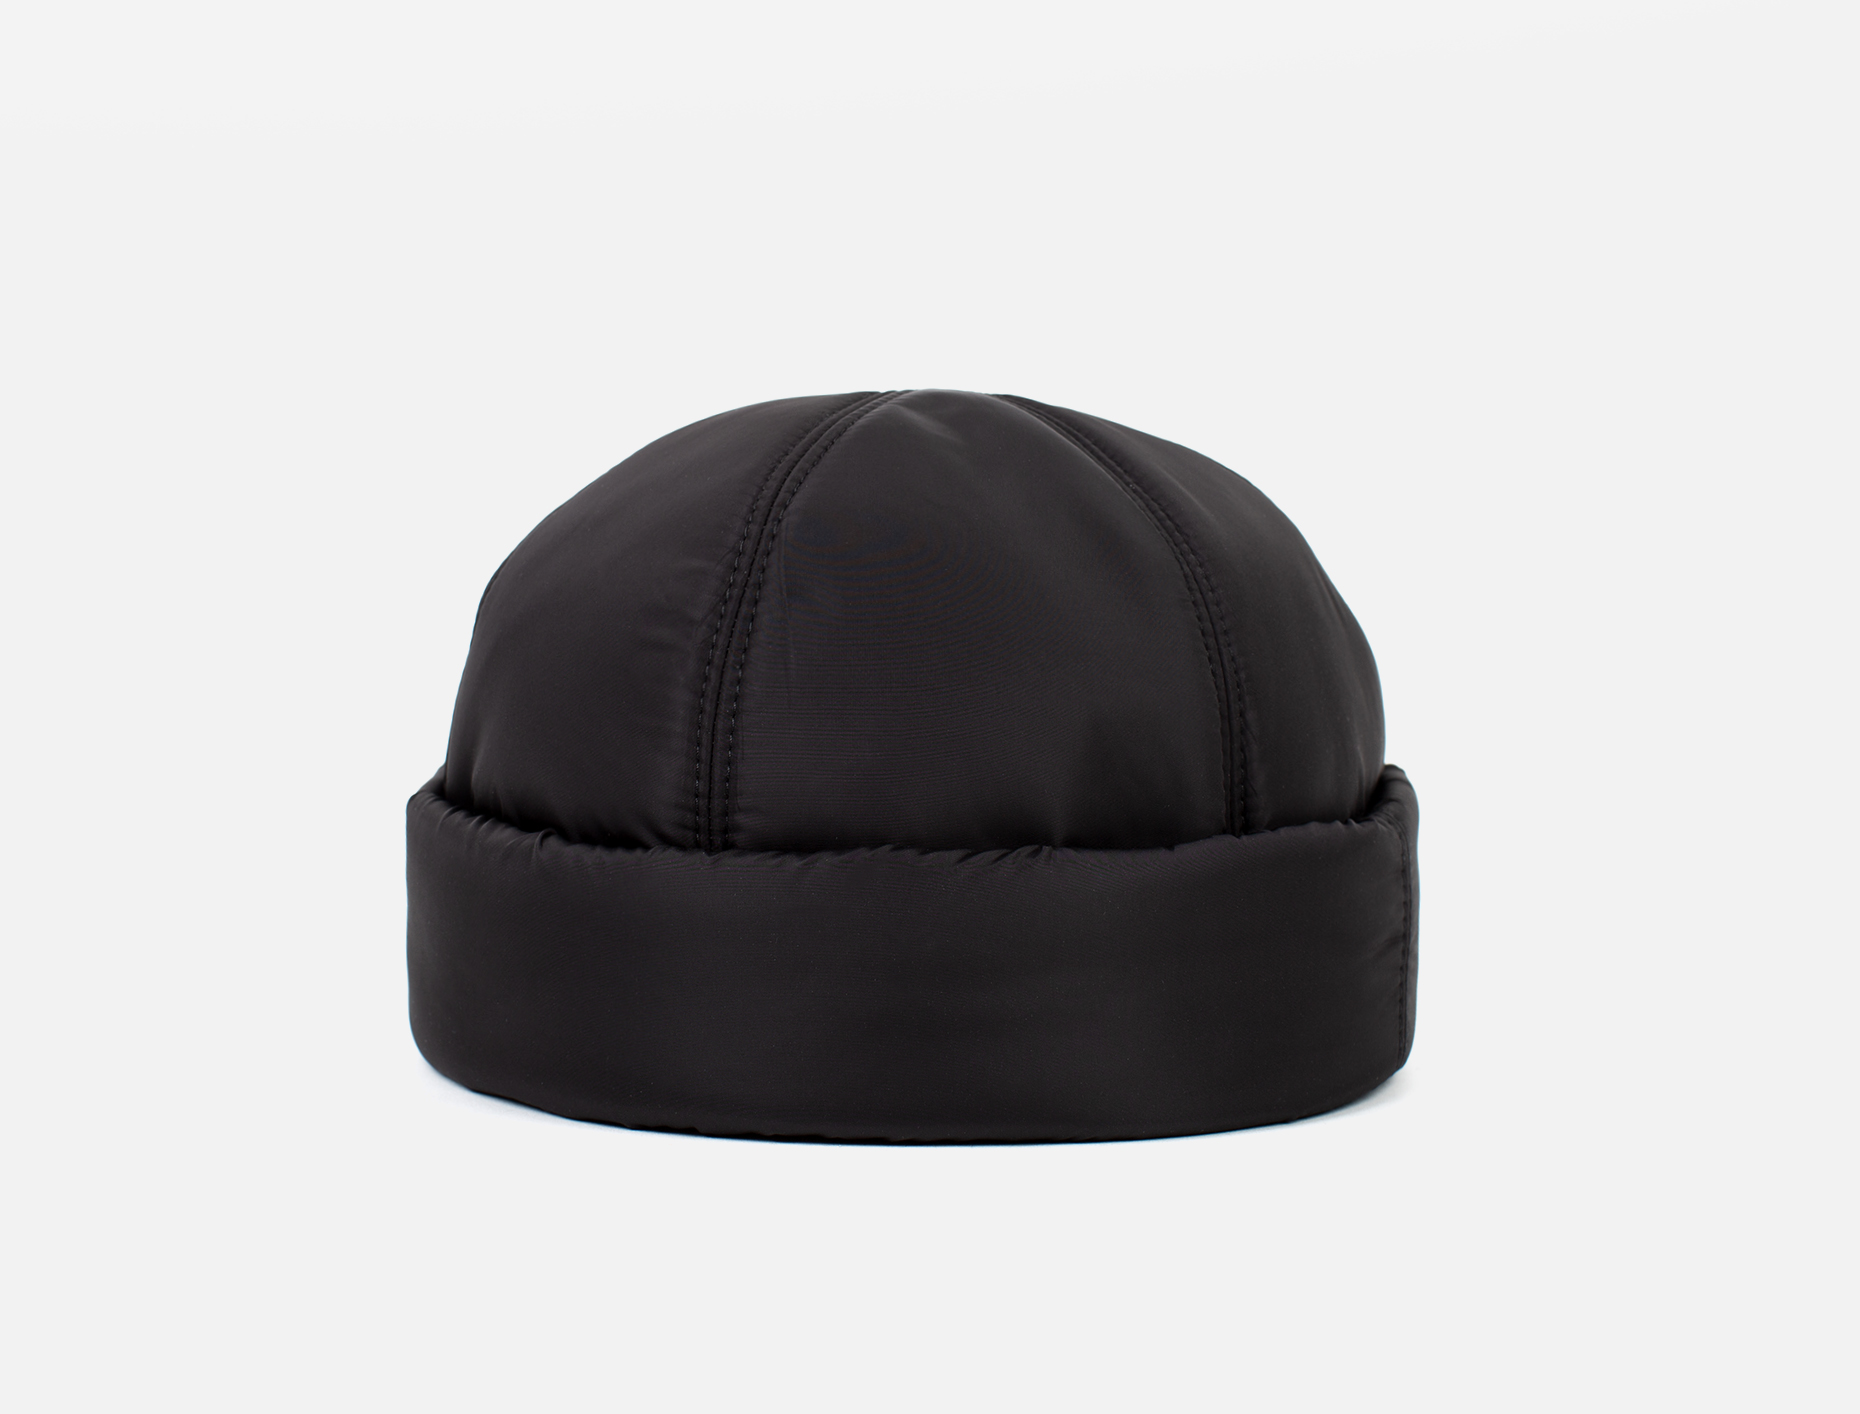 eb225c730d617 ... Vorschau  Padded Nylon Hat